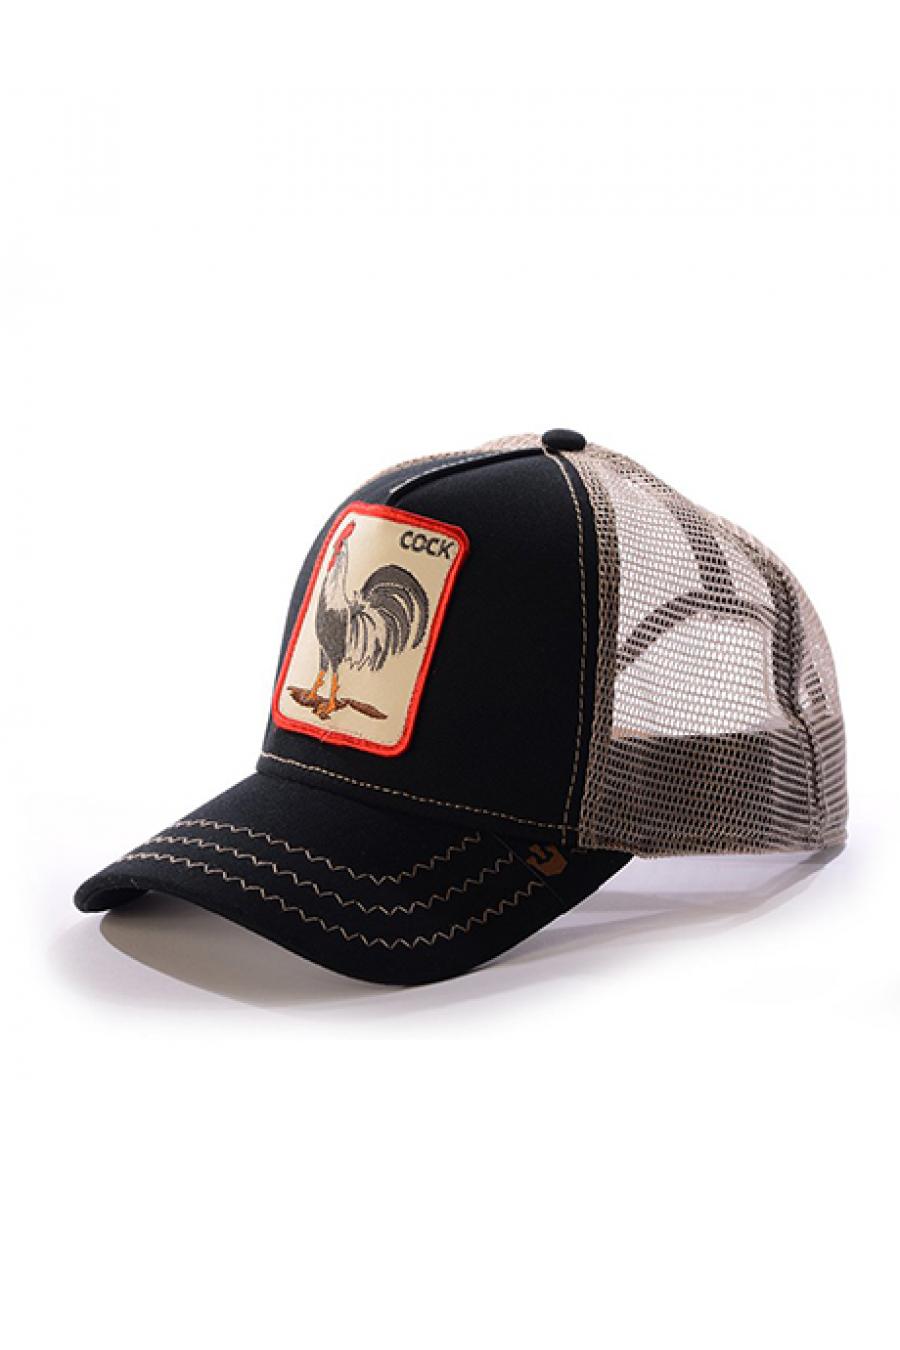 Goorin Bros - Cock Şapka